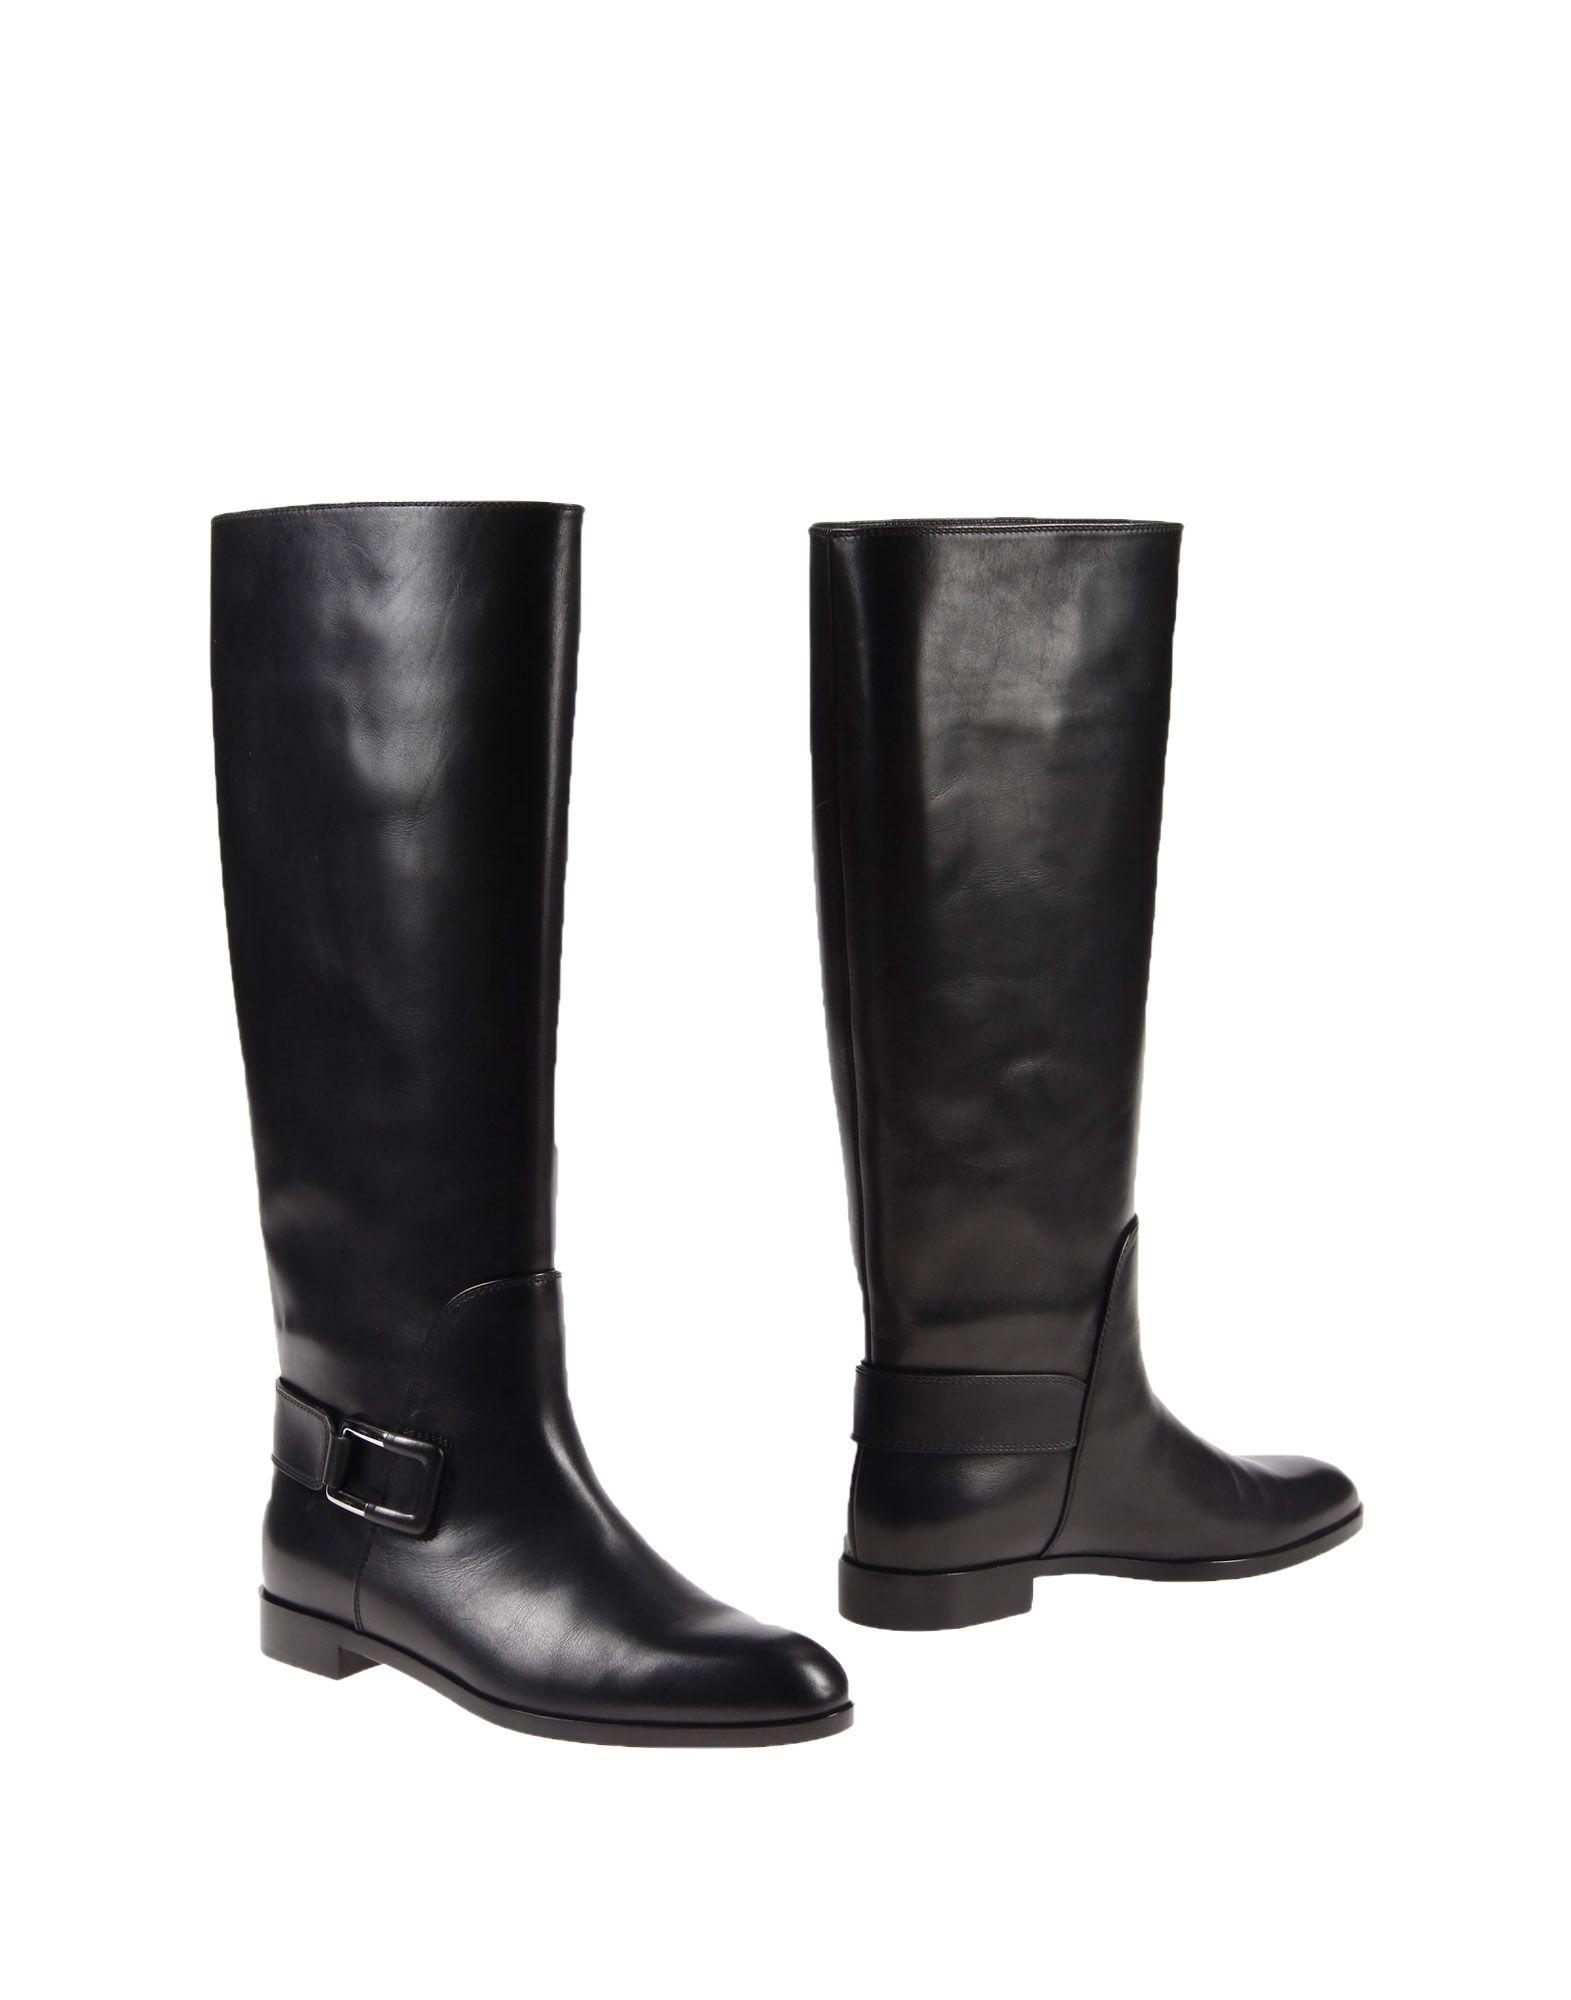 Sergio Rossi Rossi Boots - Women Sergio Rossi Rossi Boots online on  Canada - 44856548XF b0eba0